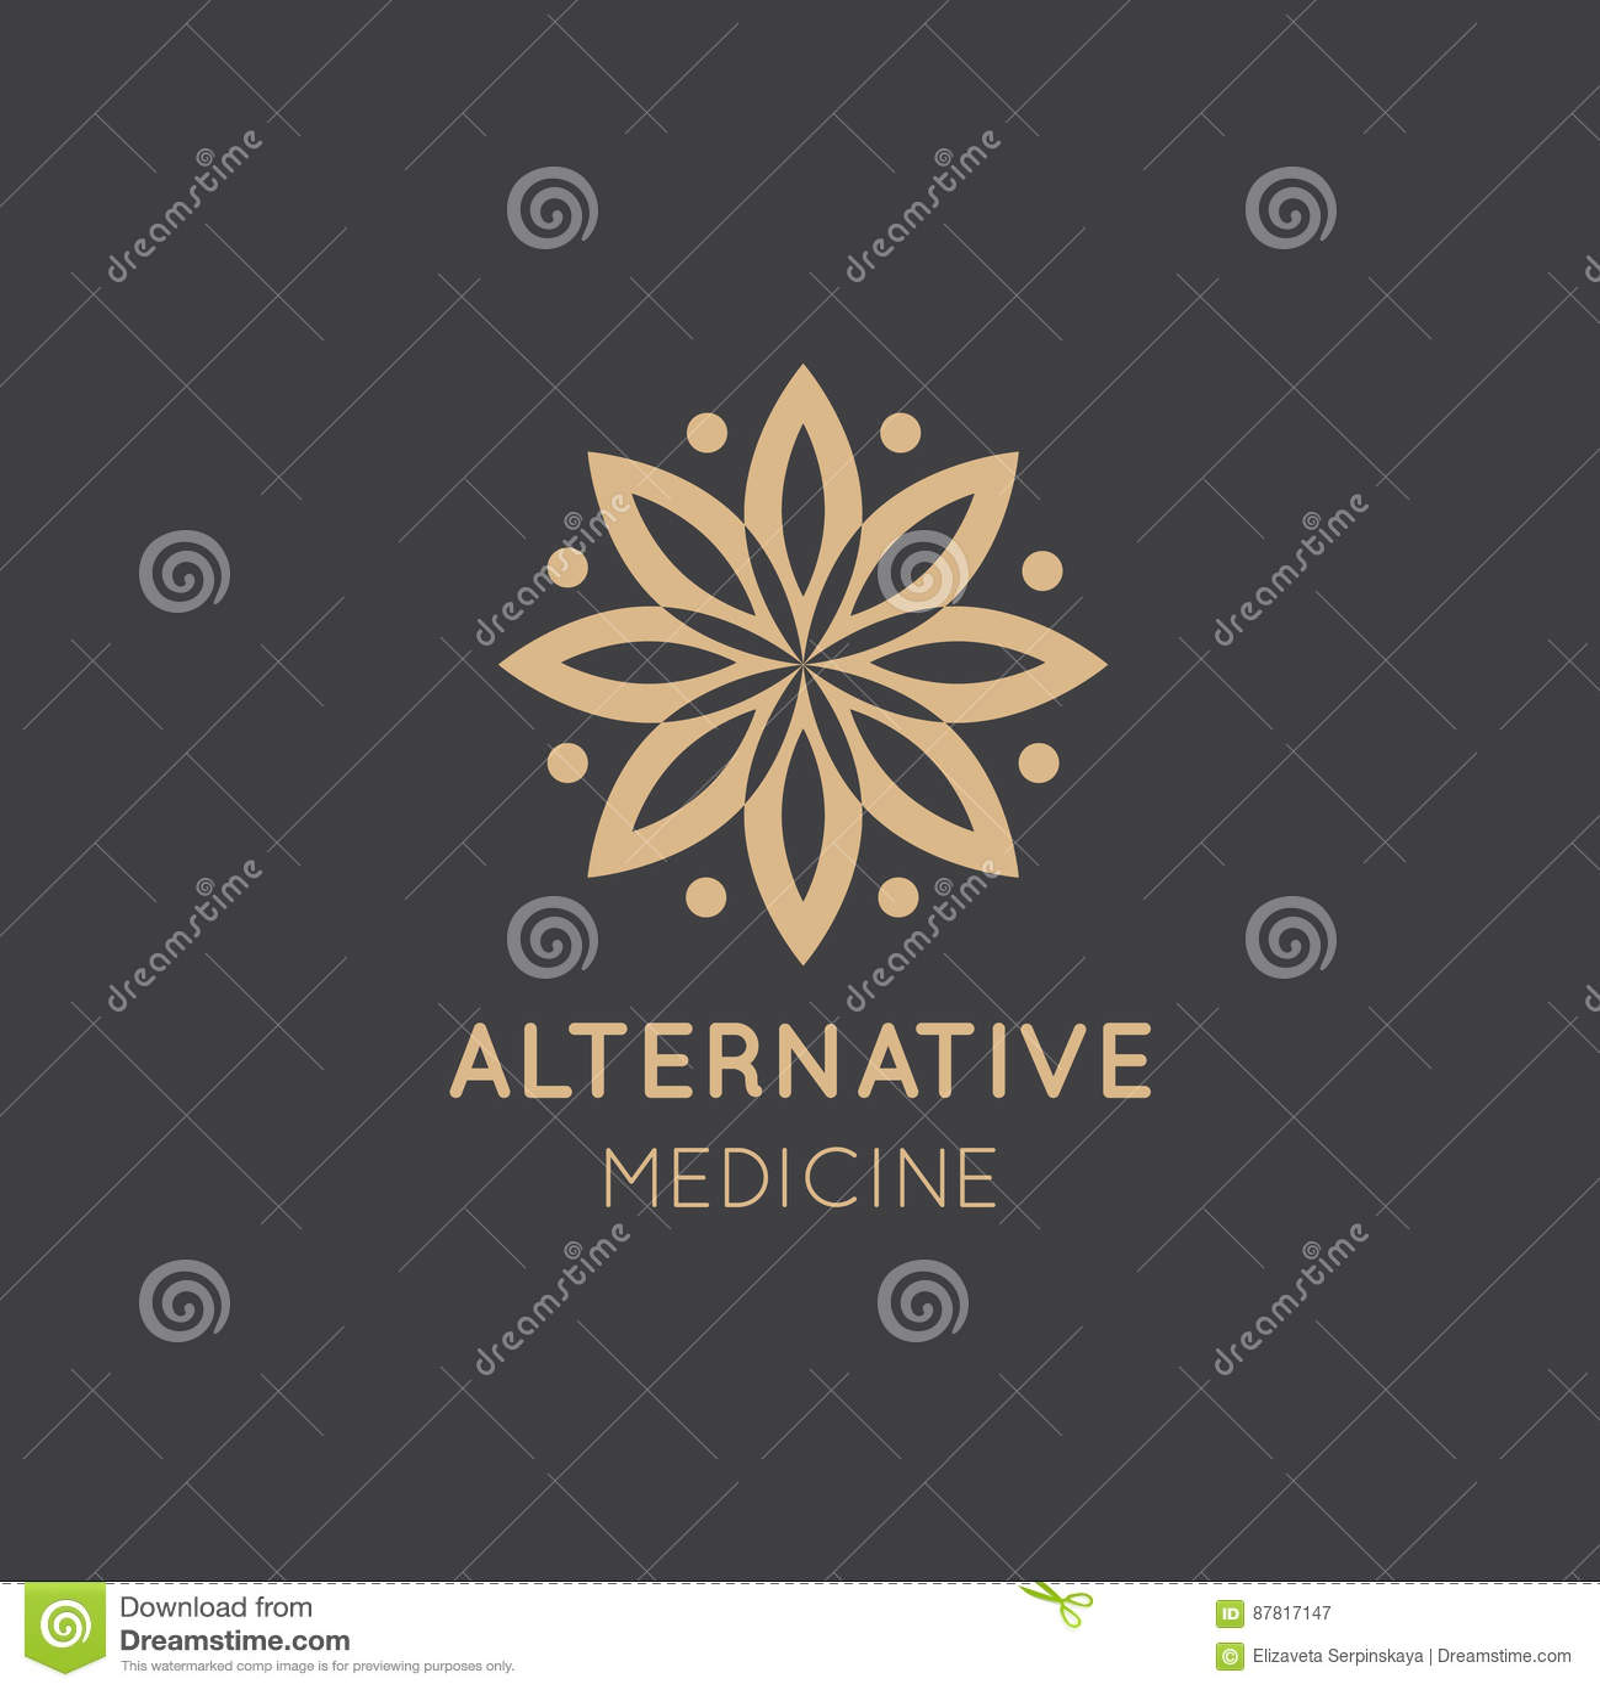 Logo Sign van Alternatieve Geneeskunde IV Vitaminetherapie, anti-Veroudert, Wellness, Ayurveda, Chinese Geneeskunde Holistic cent